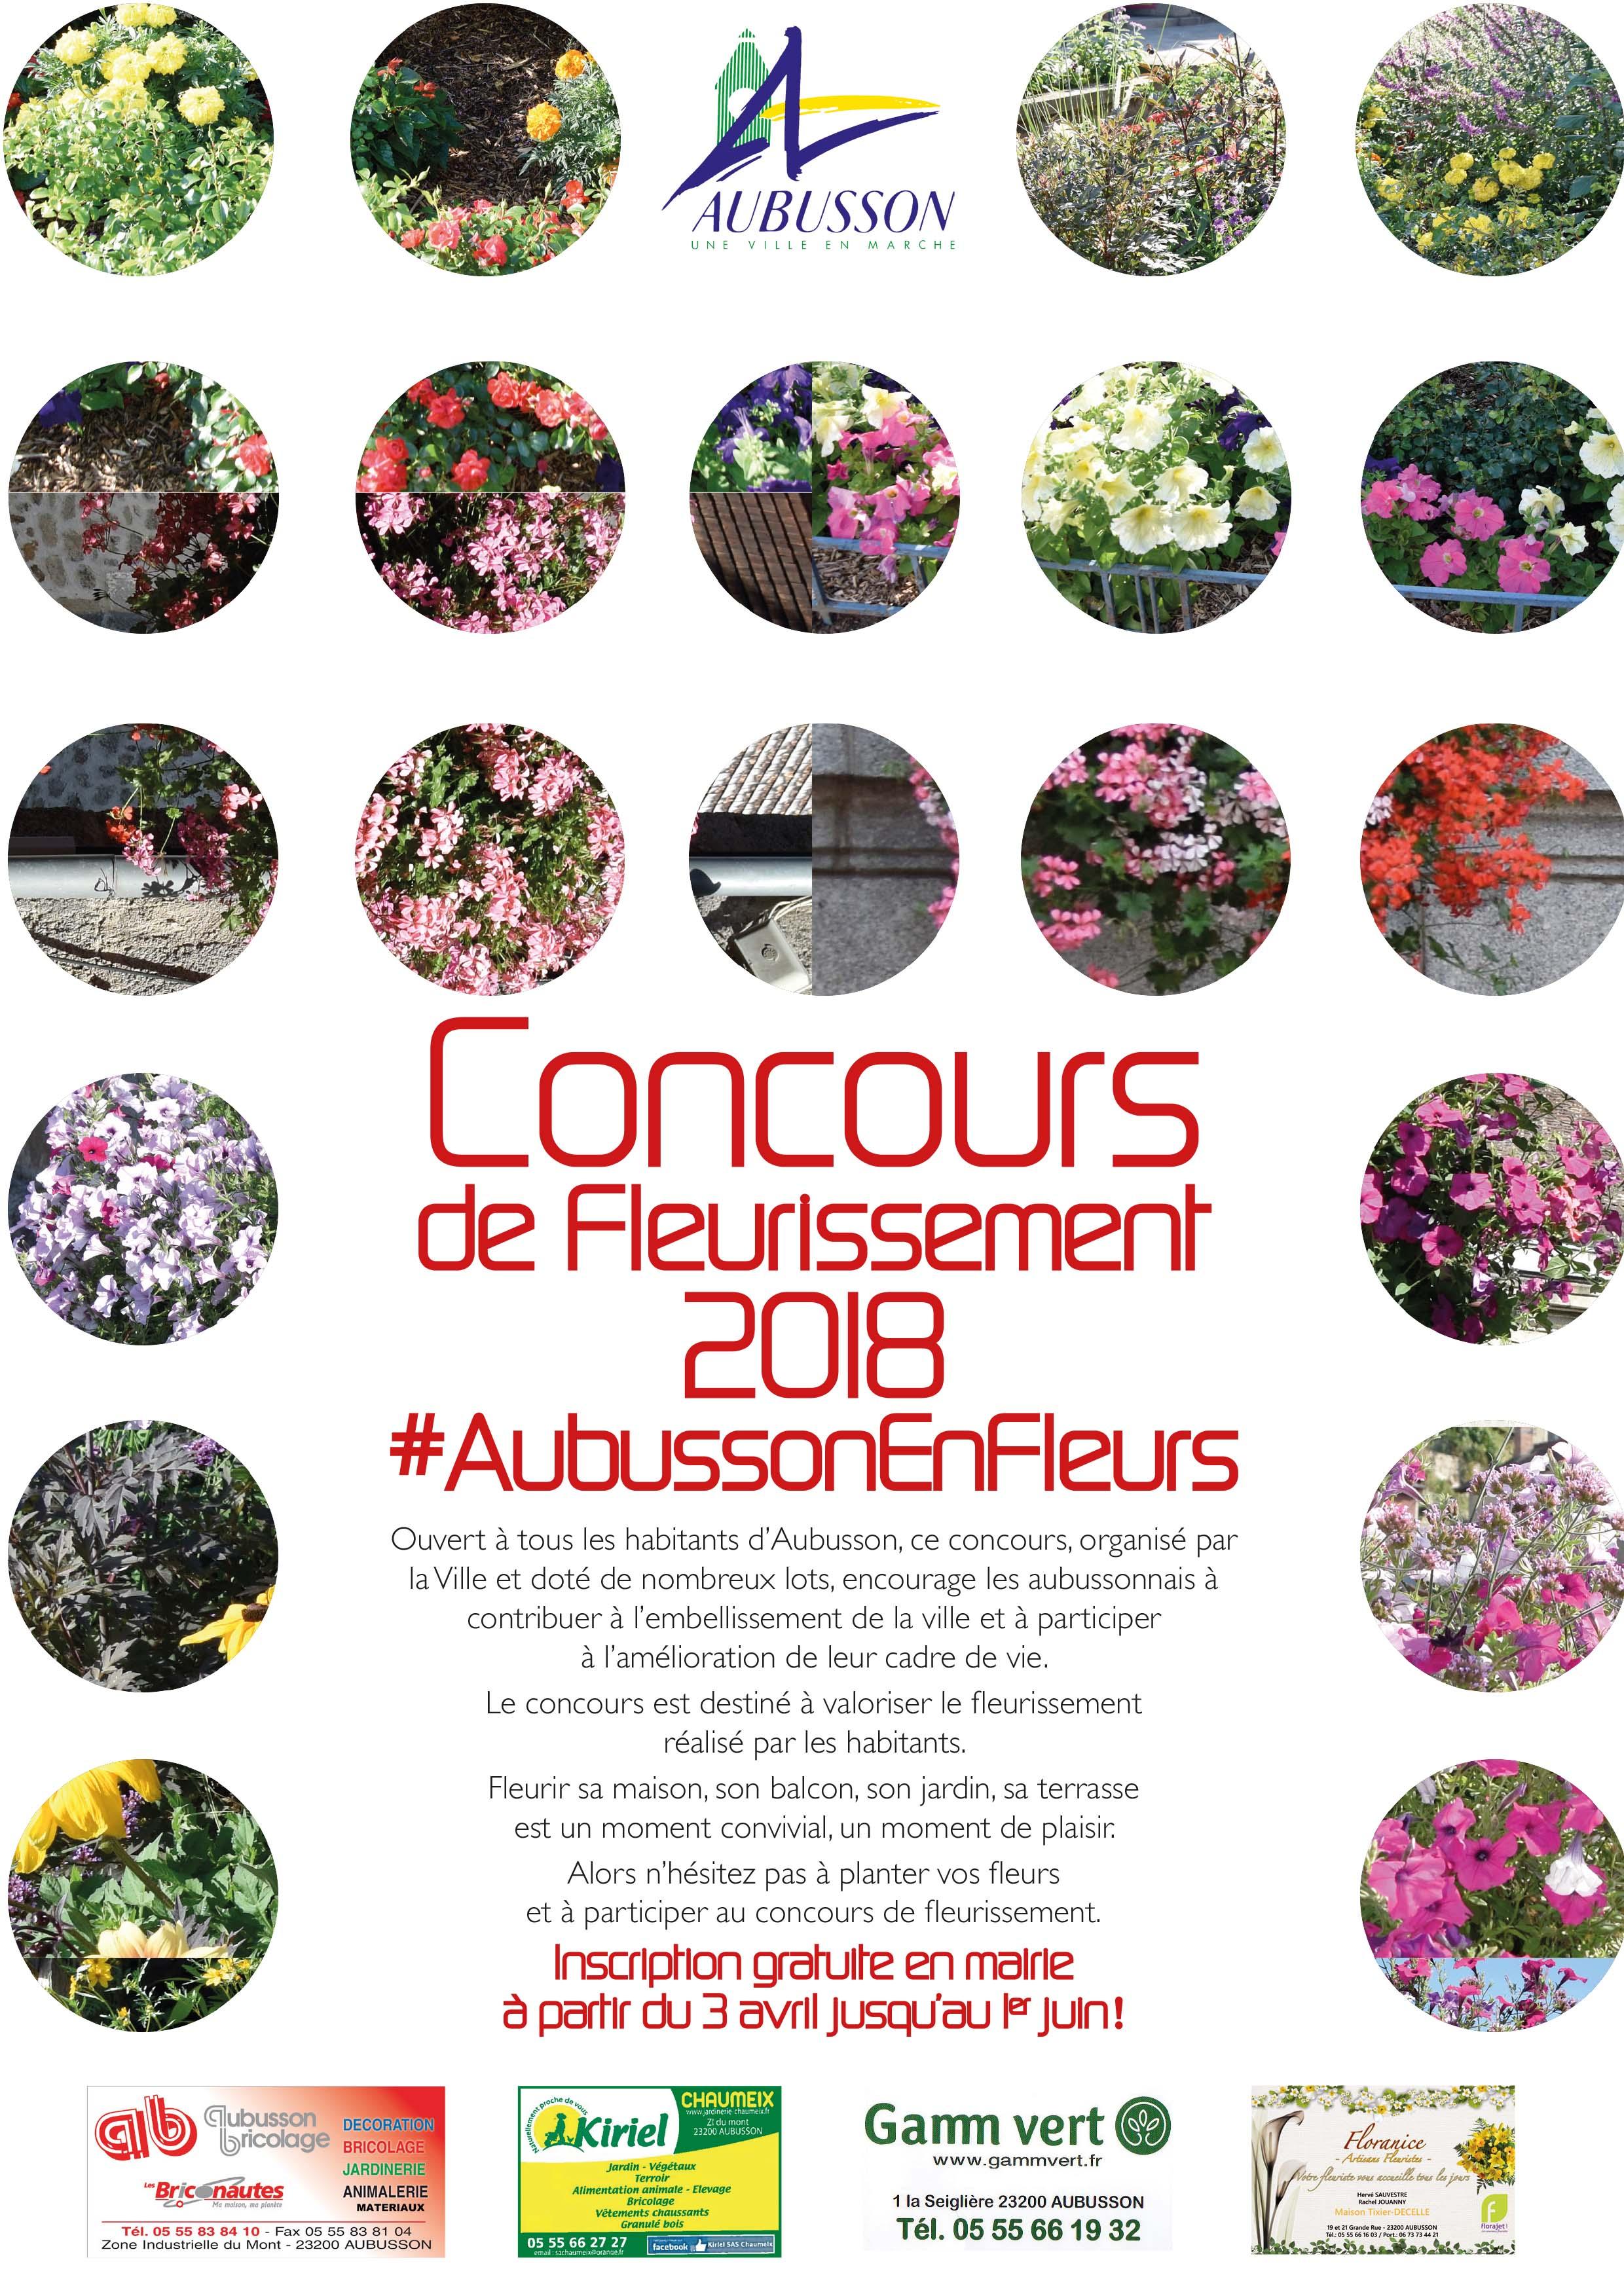 concours-de-fleurissement-2018.jpg